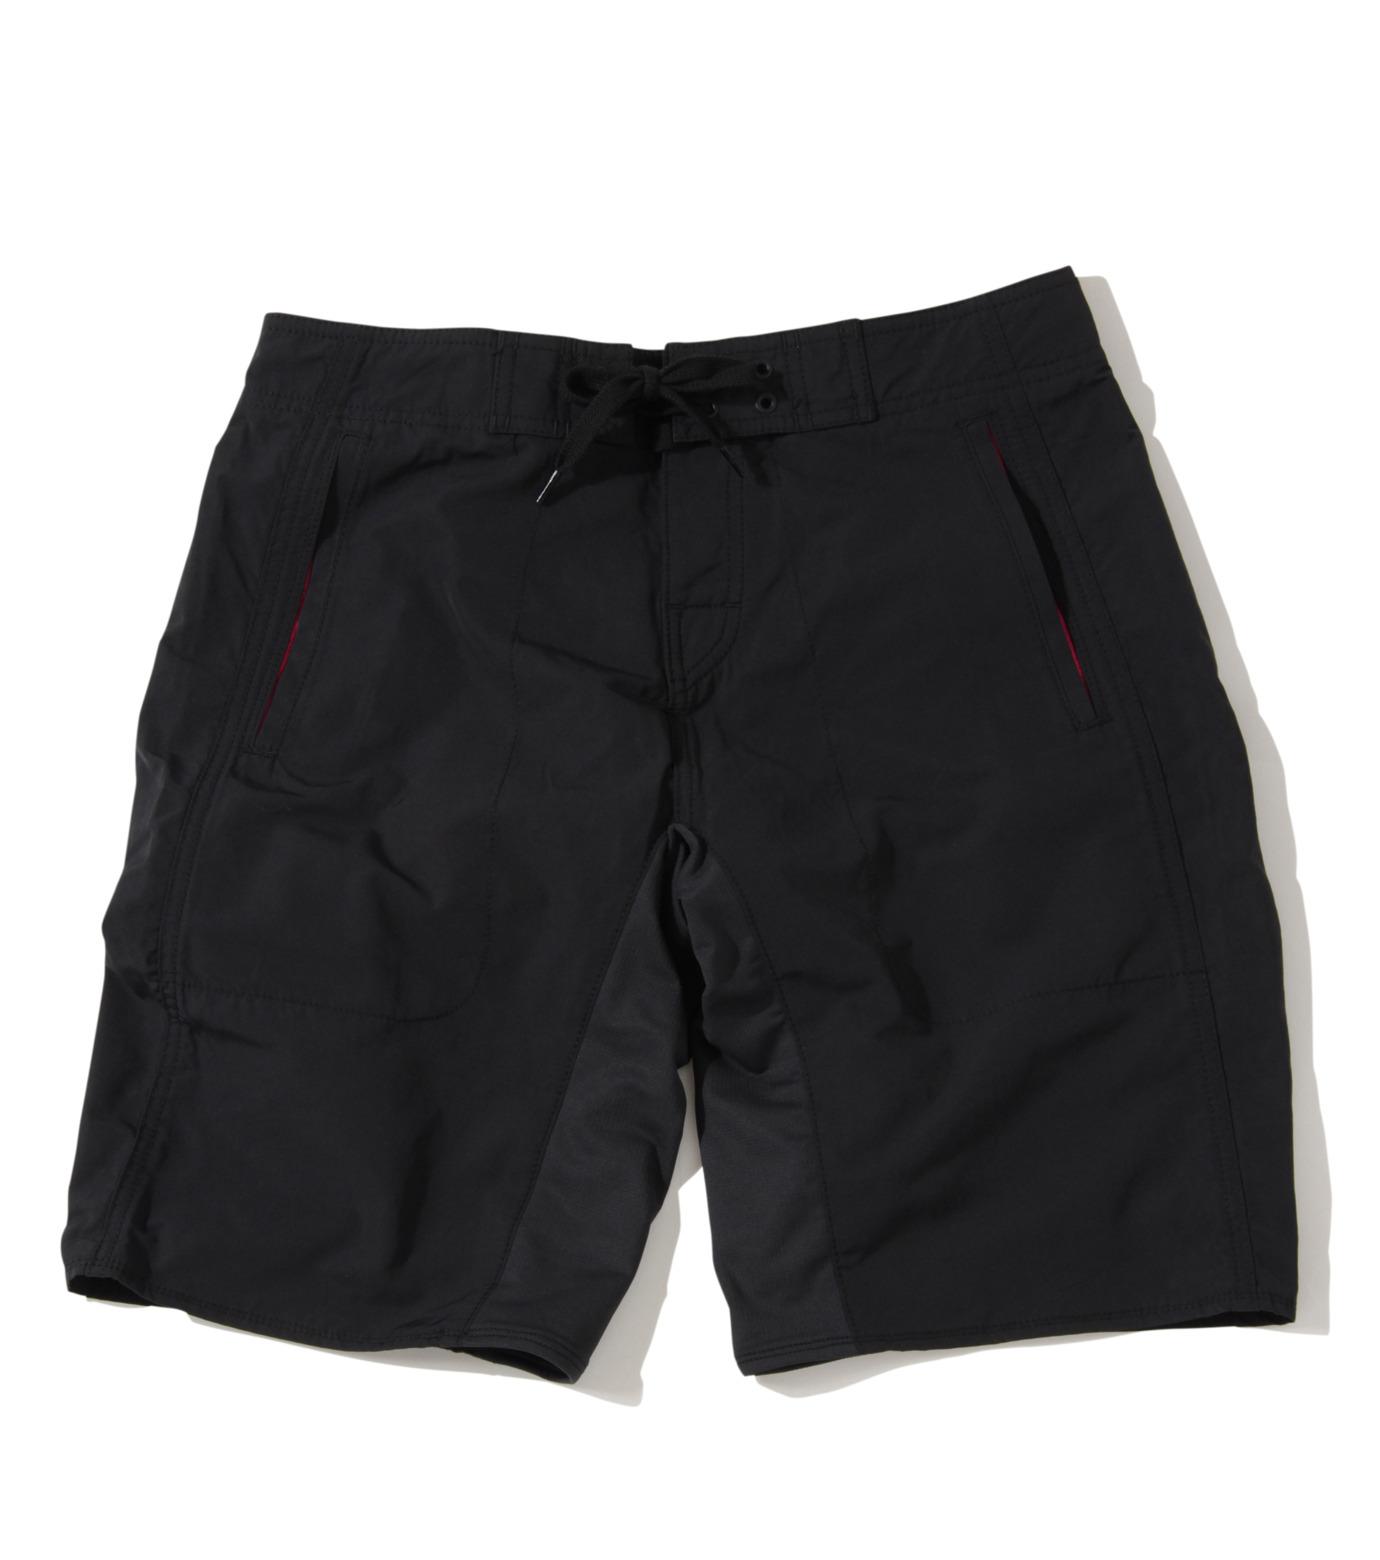 TWO TWO ONE(トゥートゥーワン)のSurf shorts long-BLACK(SWIMWEAR/SWIMWEAR)-15N948002-13 拡大詳細画像1